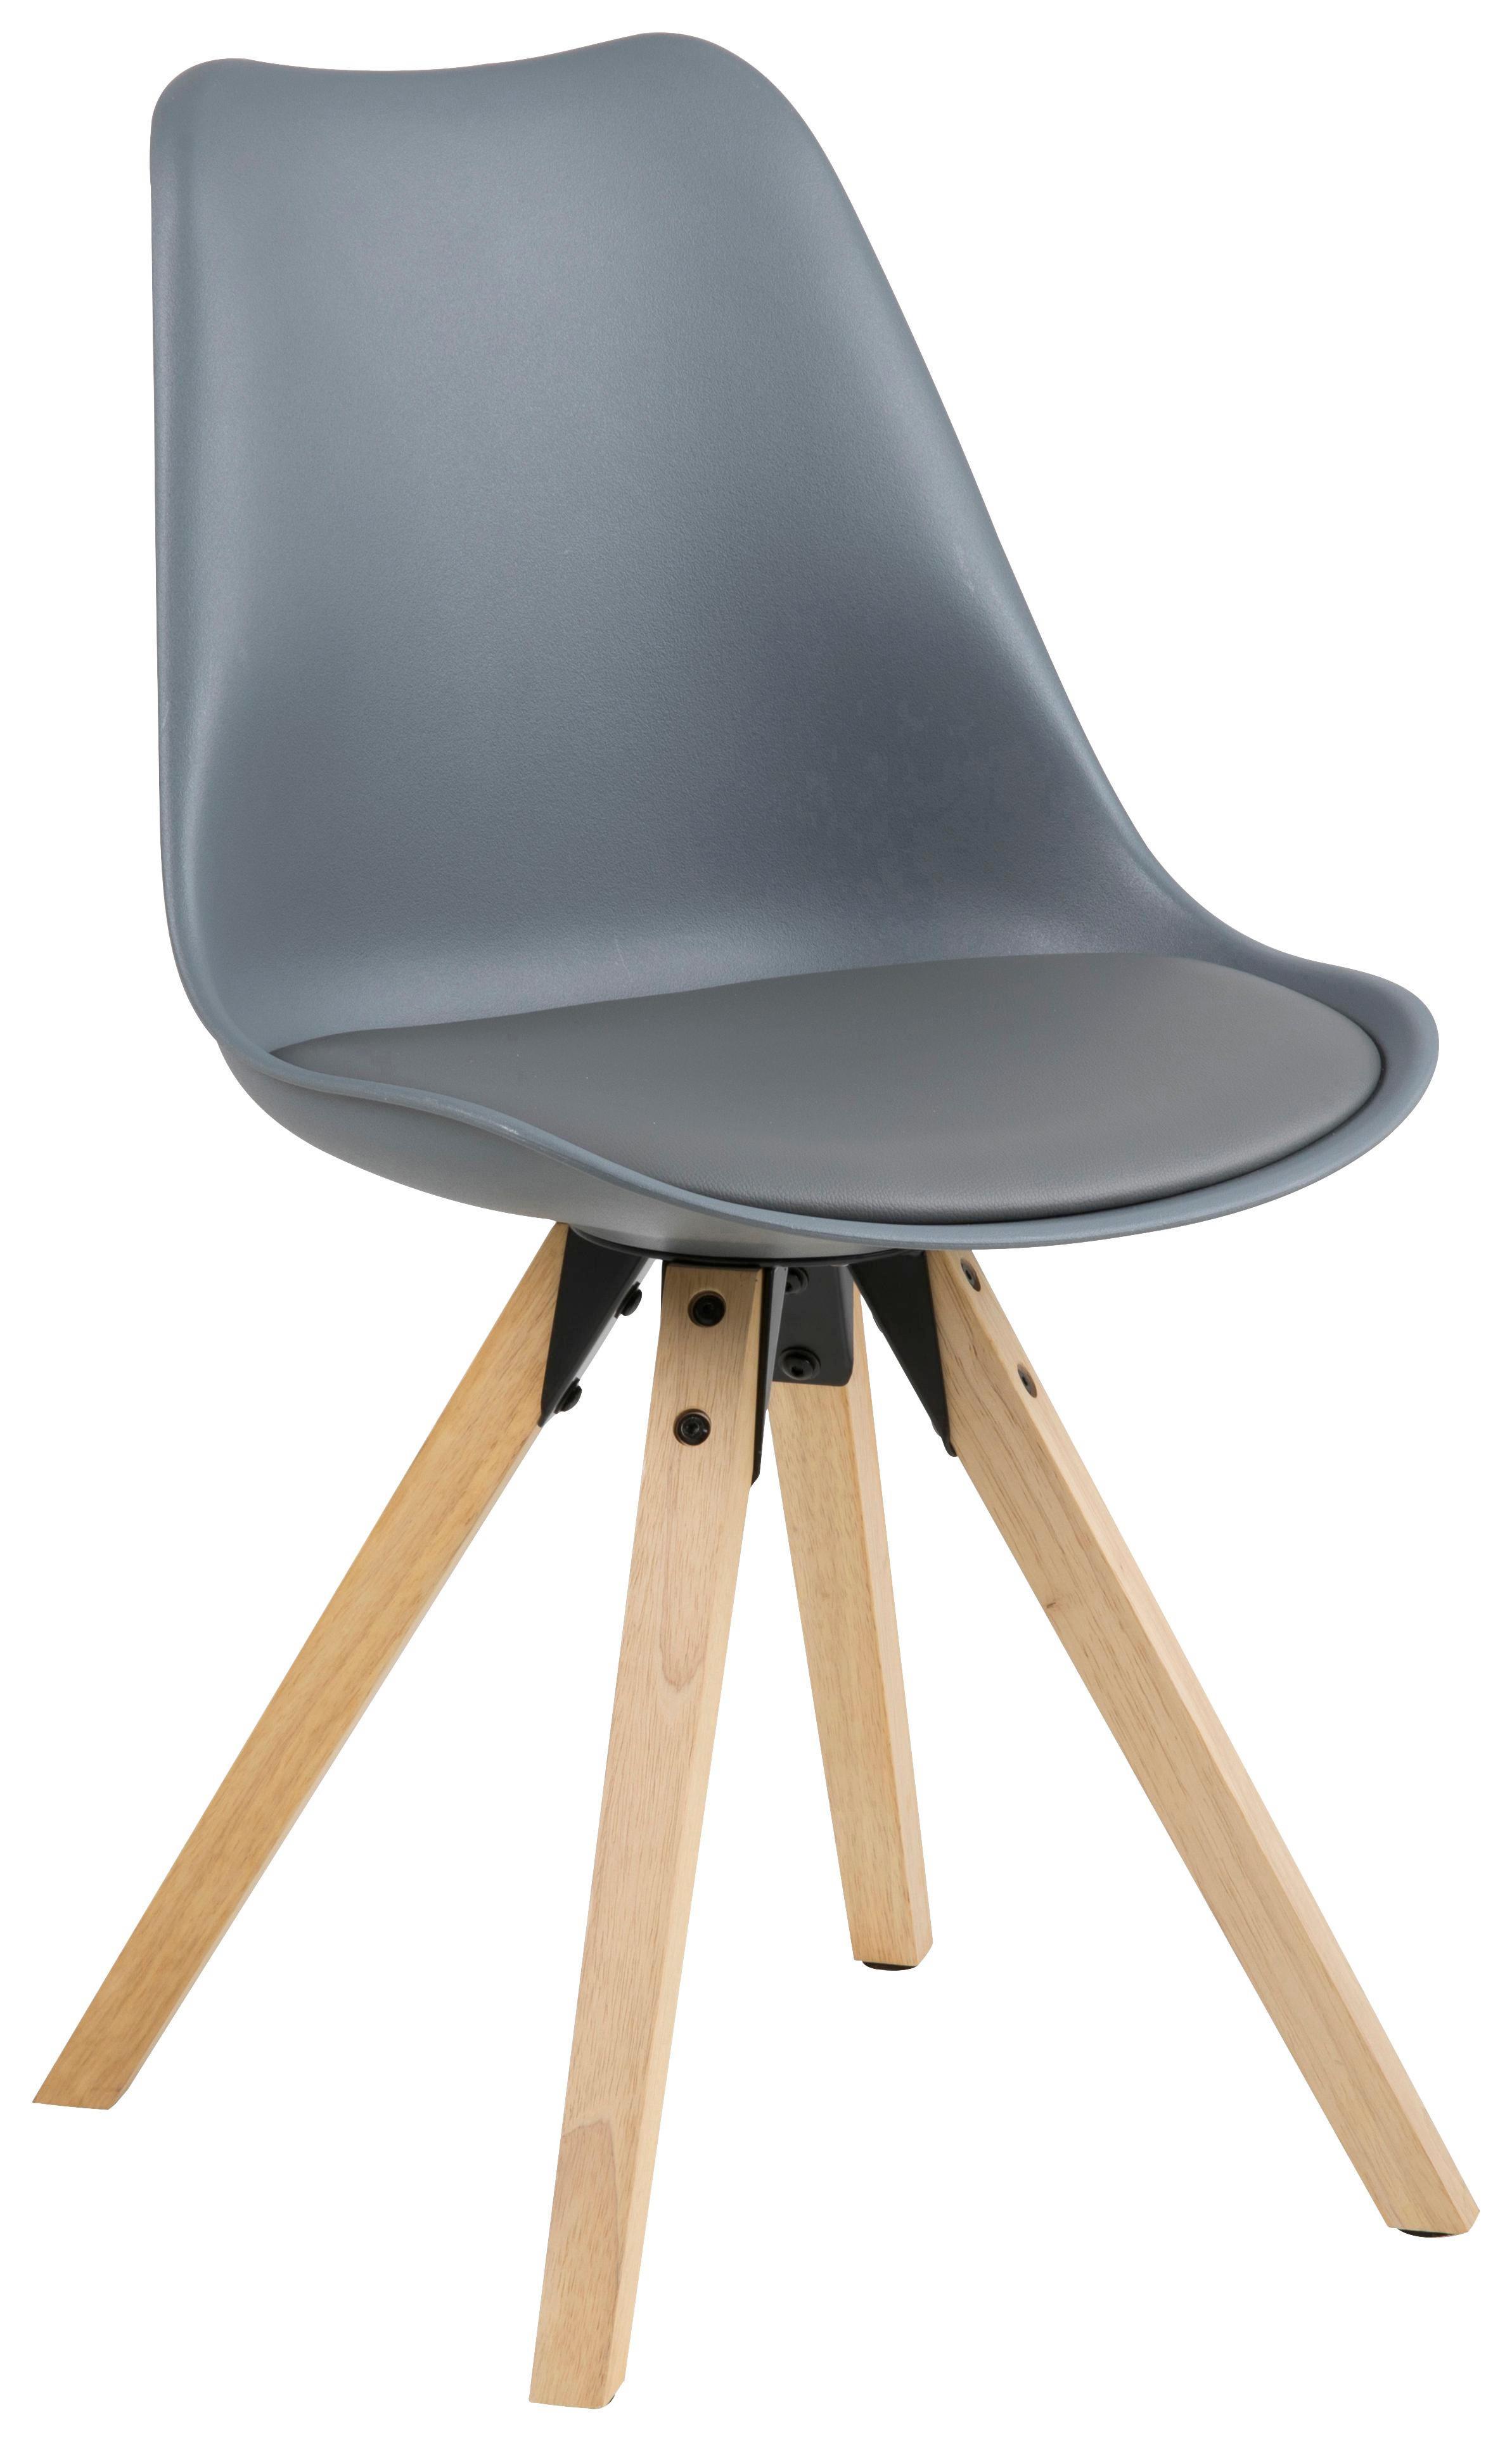 STUHL Lederlook Grau   Eichefarben/Grau, Design, Holz/Kunststoff (48/